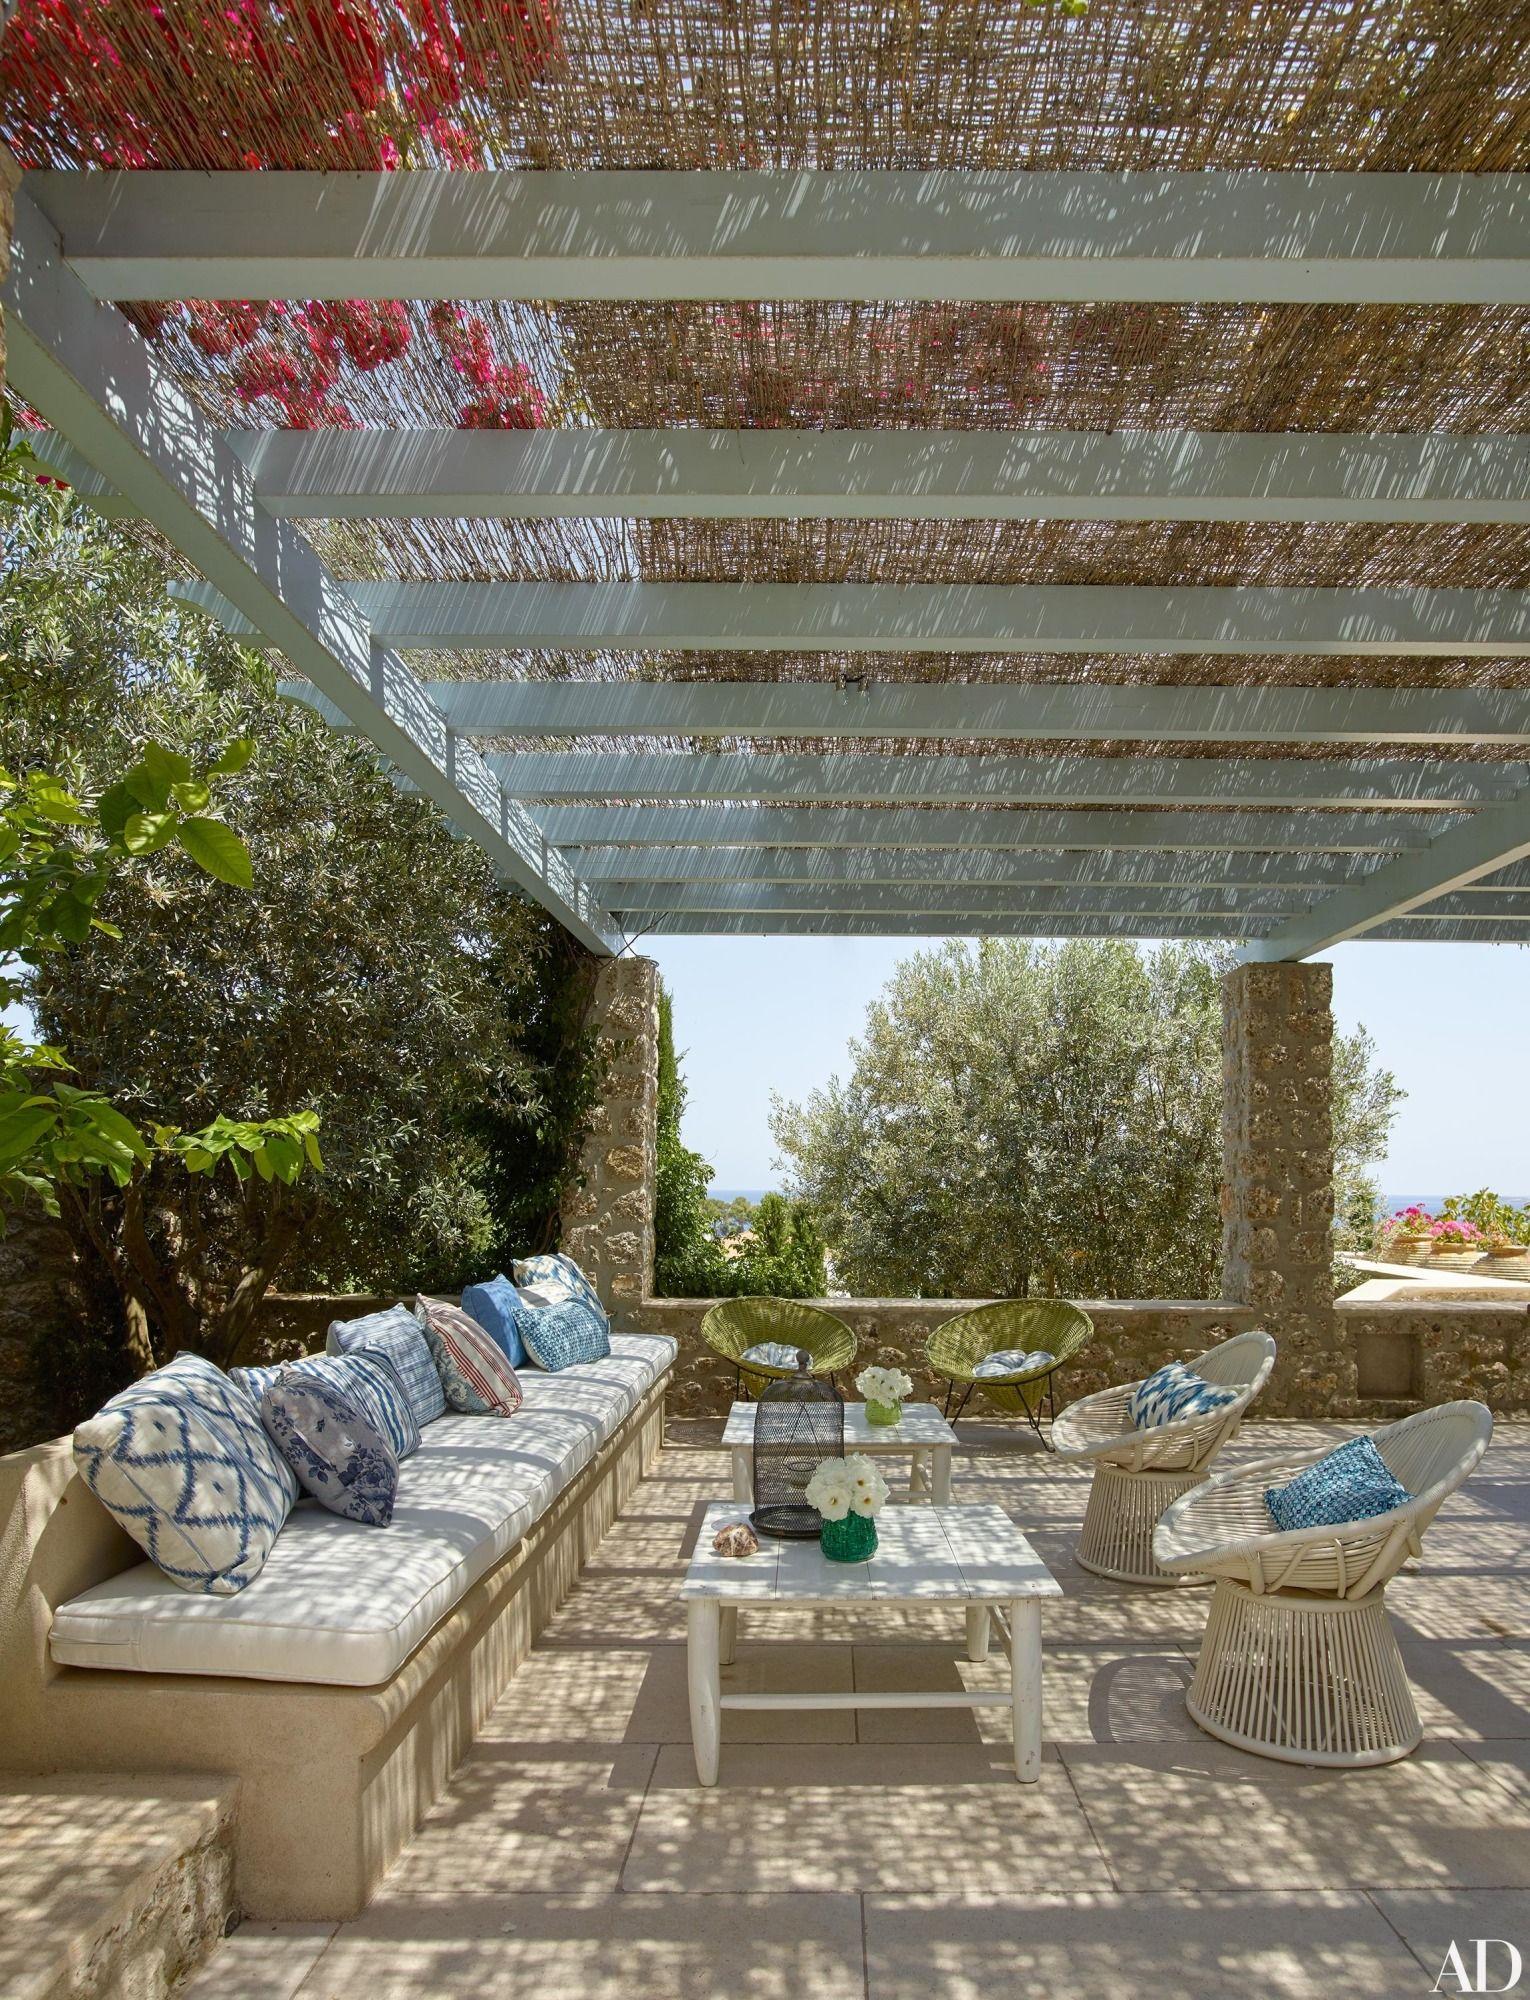 Willow panels filter sunlight on a terrace.